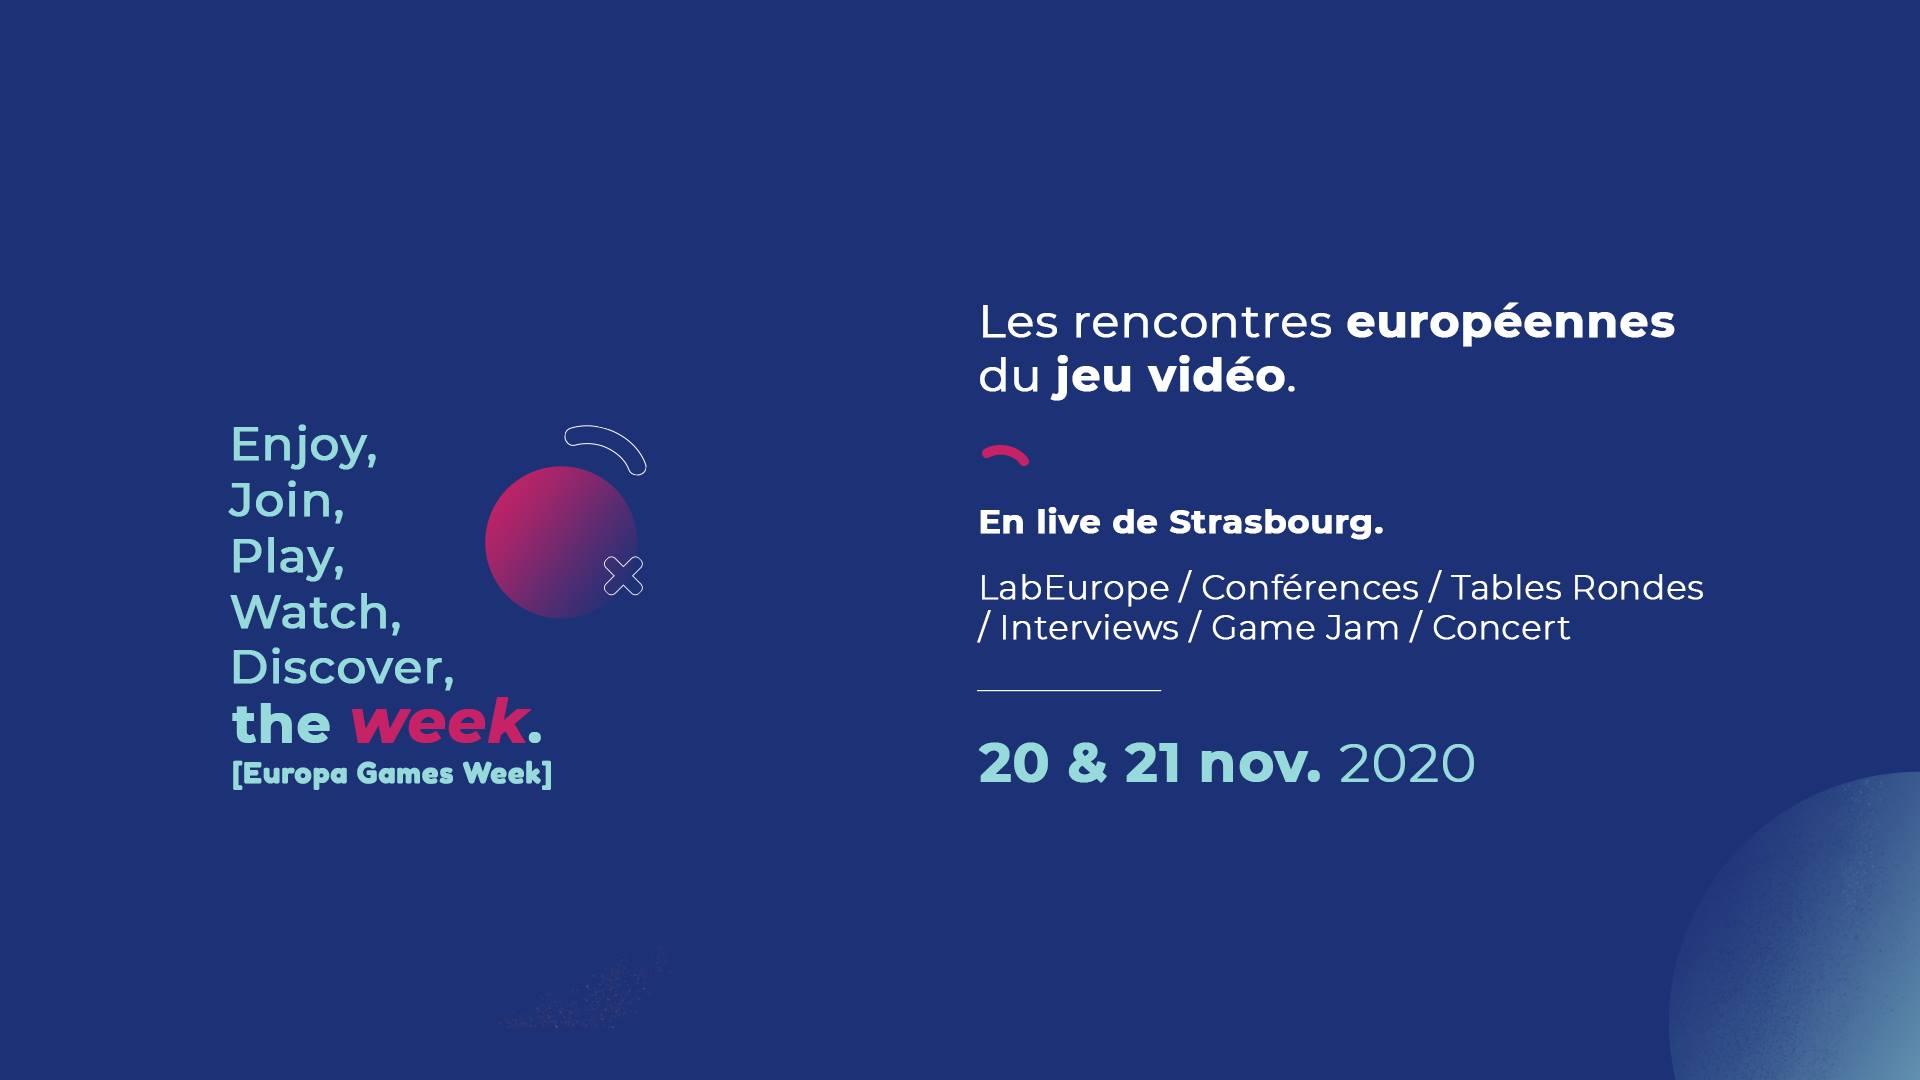 [ÉVÉNEMENT] Europa Games Week 2020